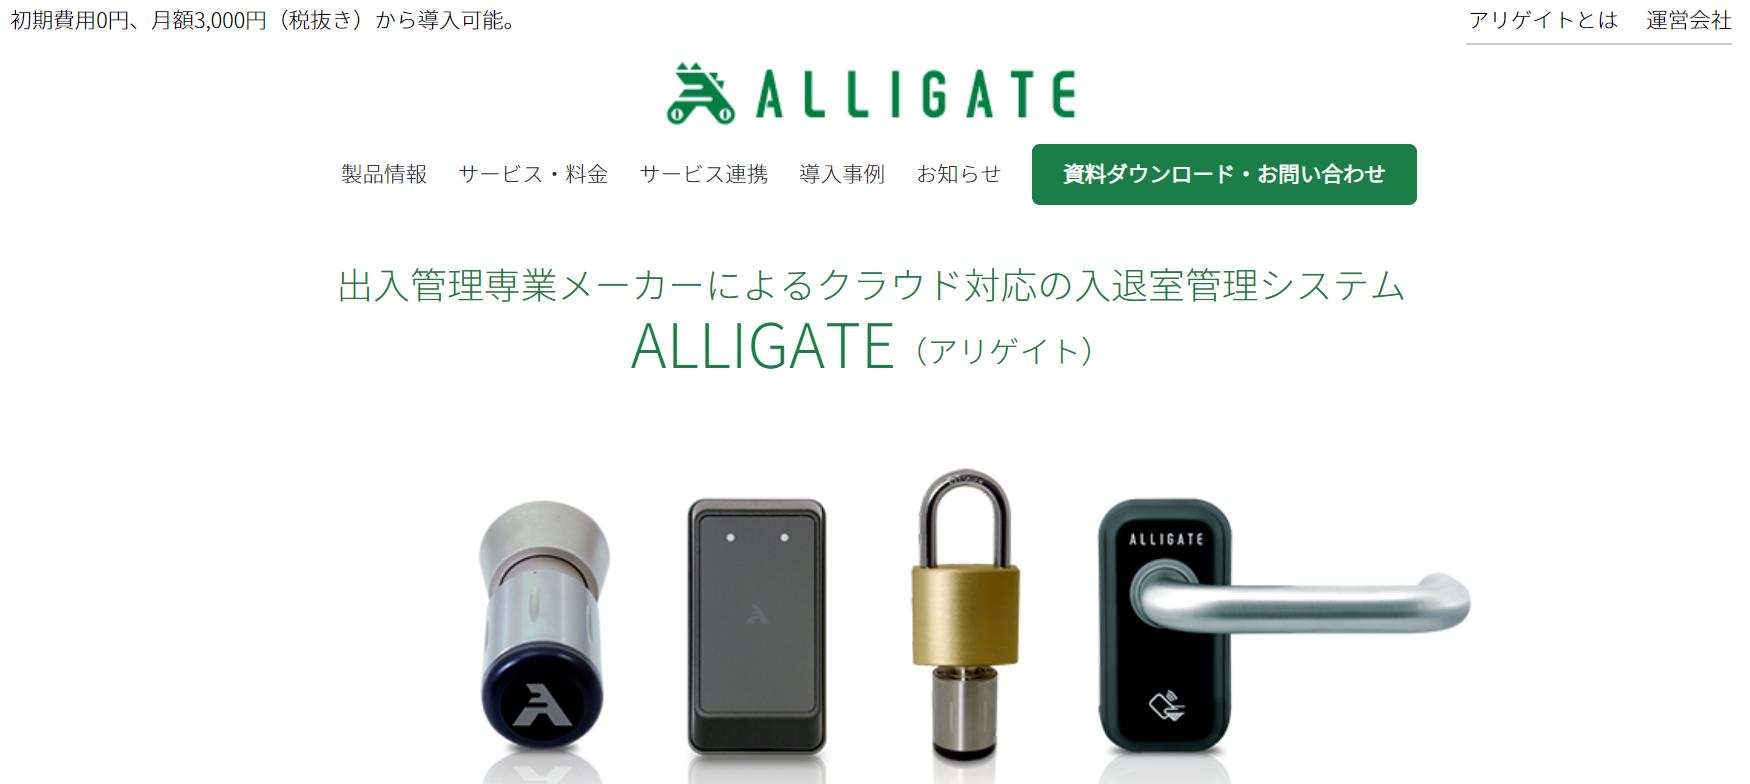 Alligate